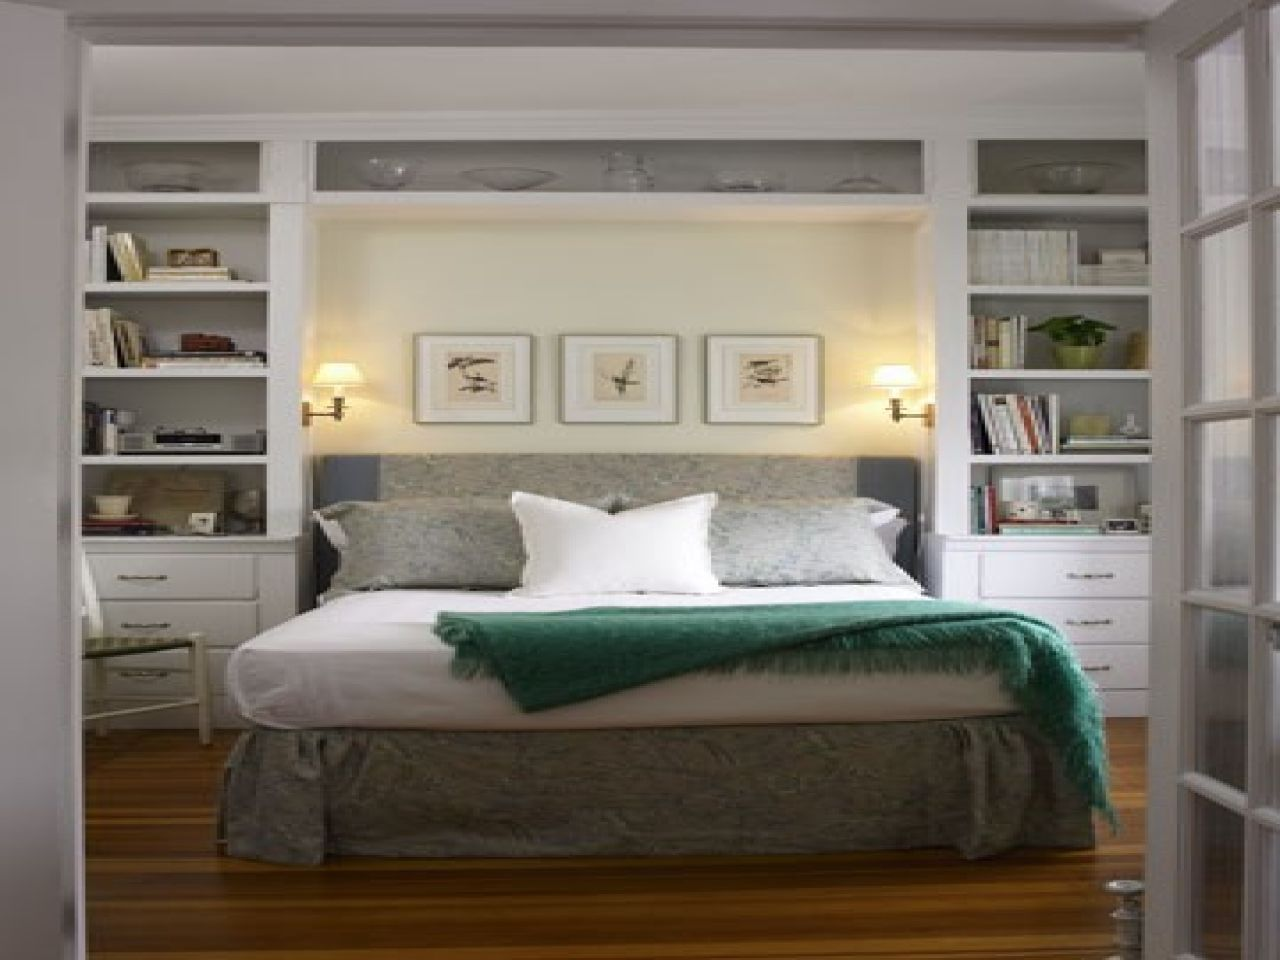 Bedroom built in bedroom bookshelf built in shelves